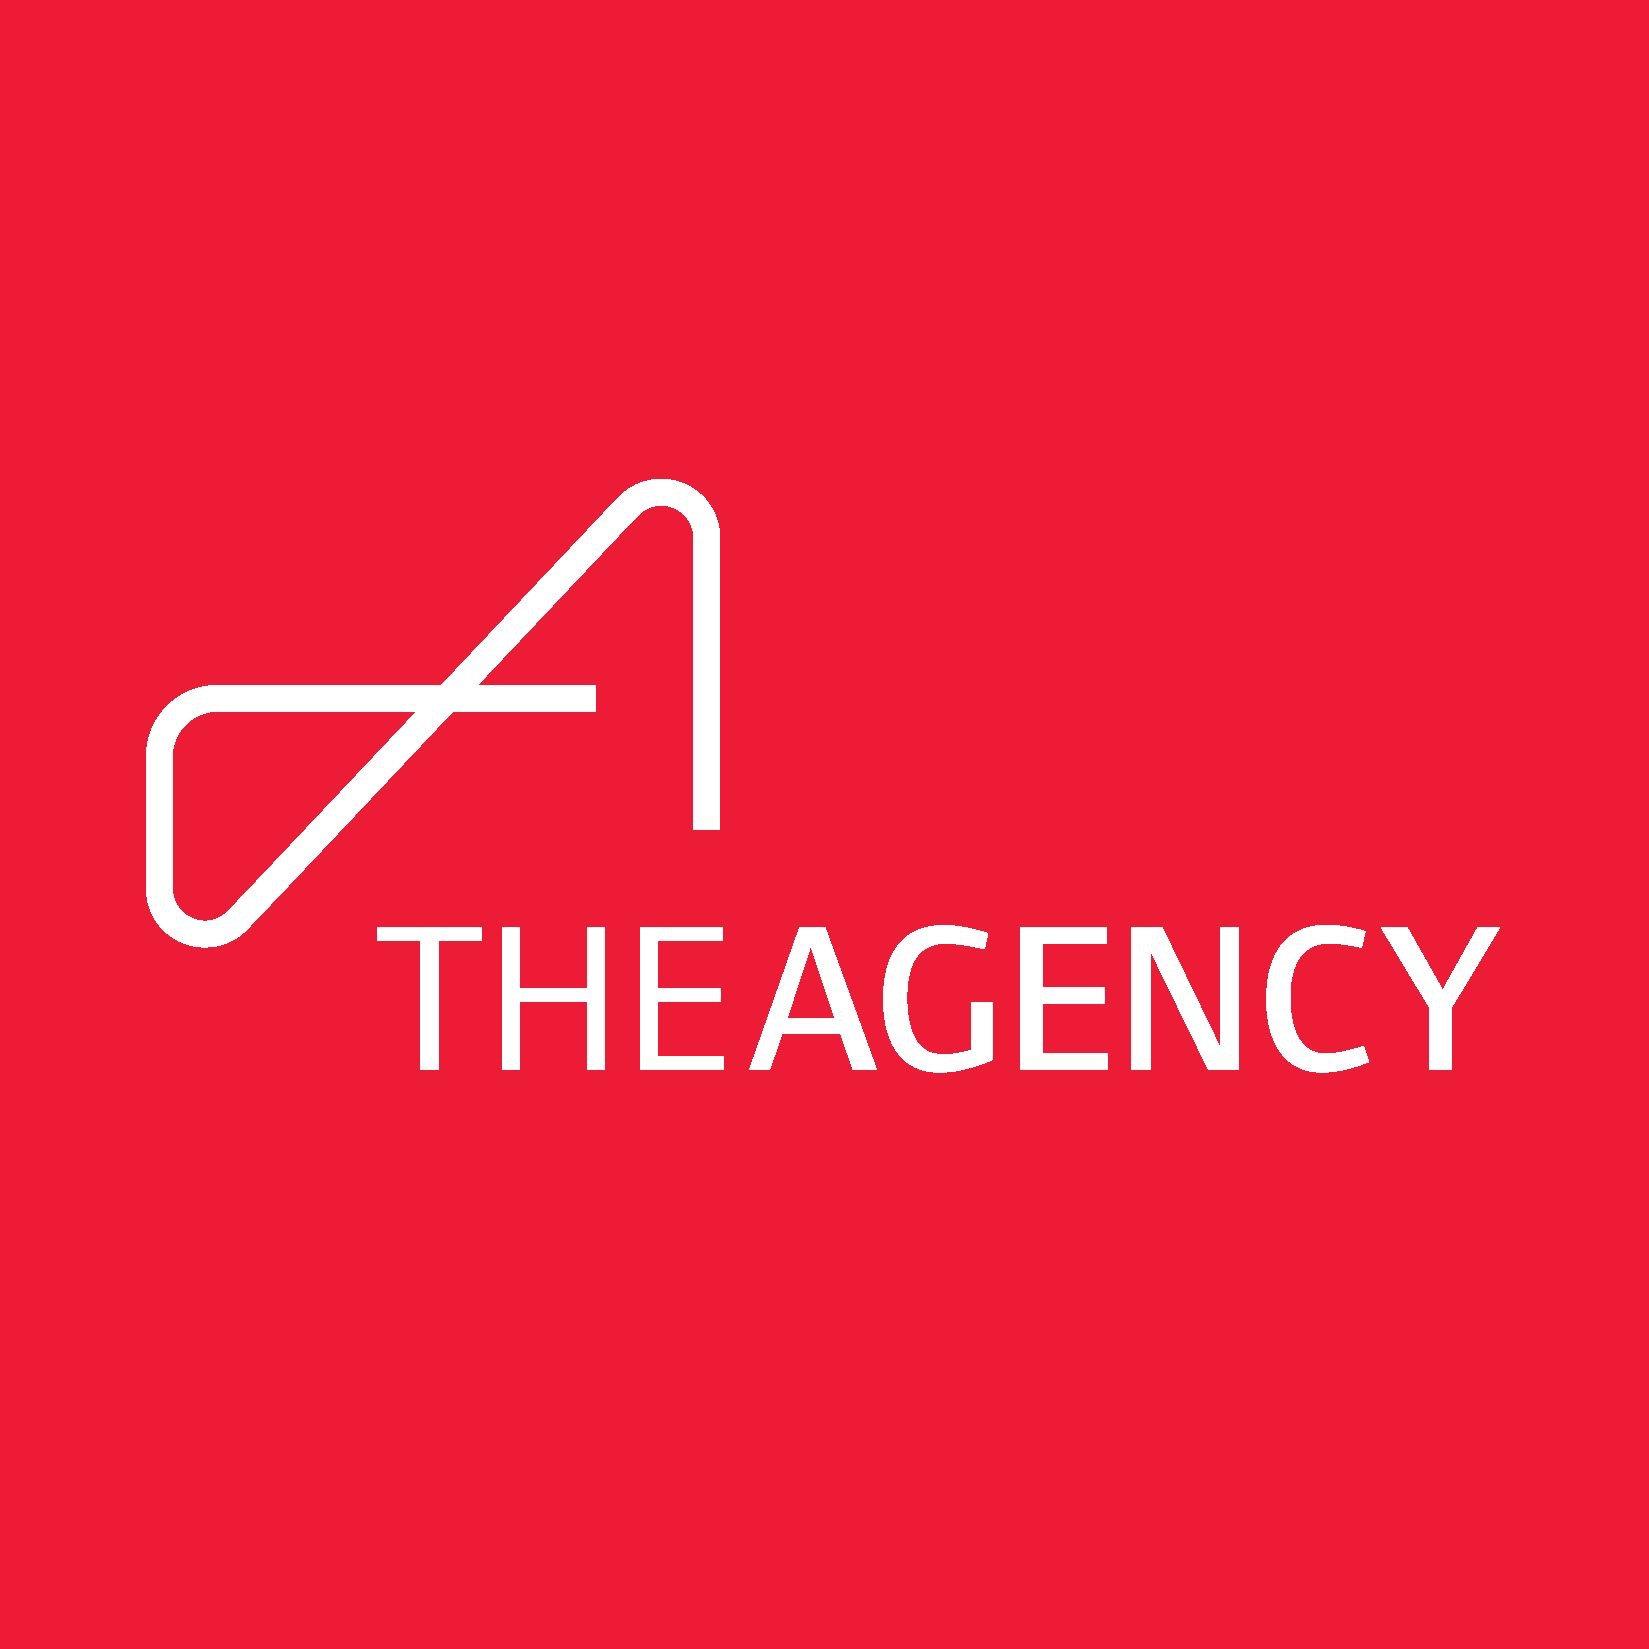 the-agency-logo.jpg